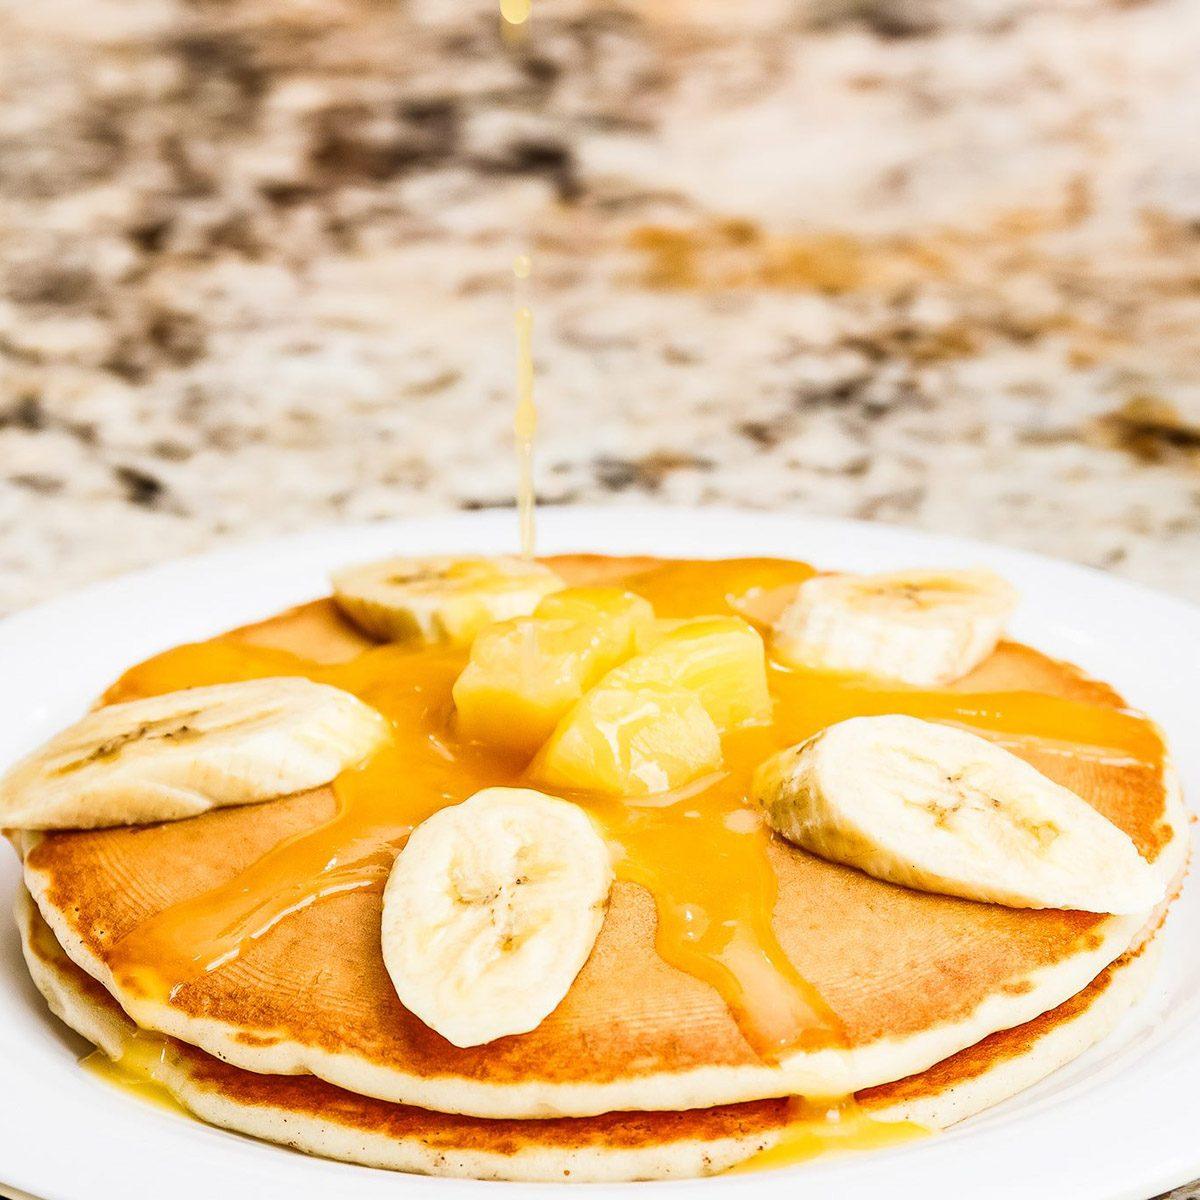 Citrus Breakfast & Lunch, Virginia Beach pancakes